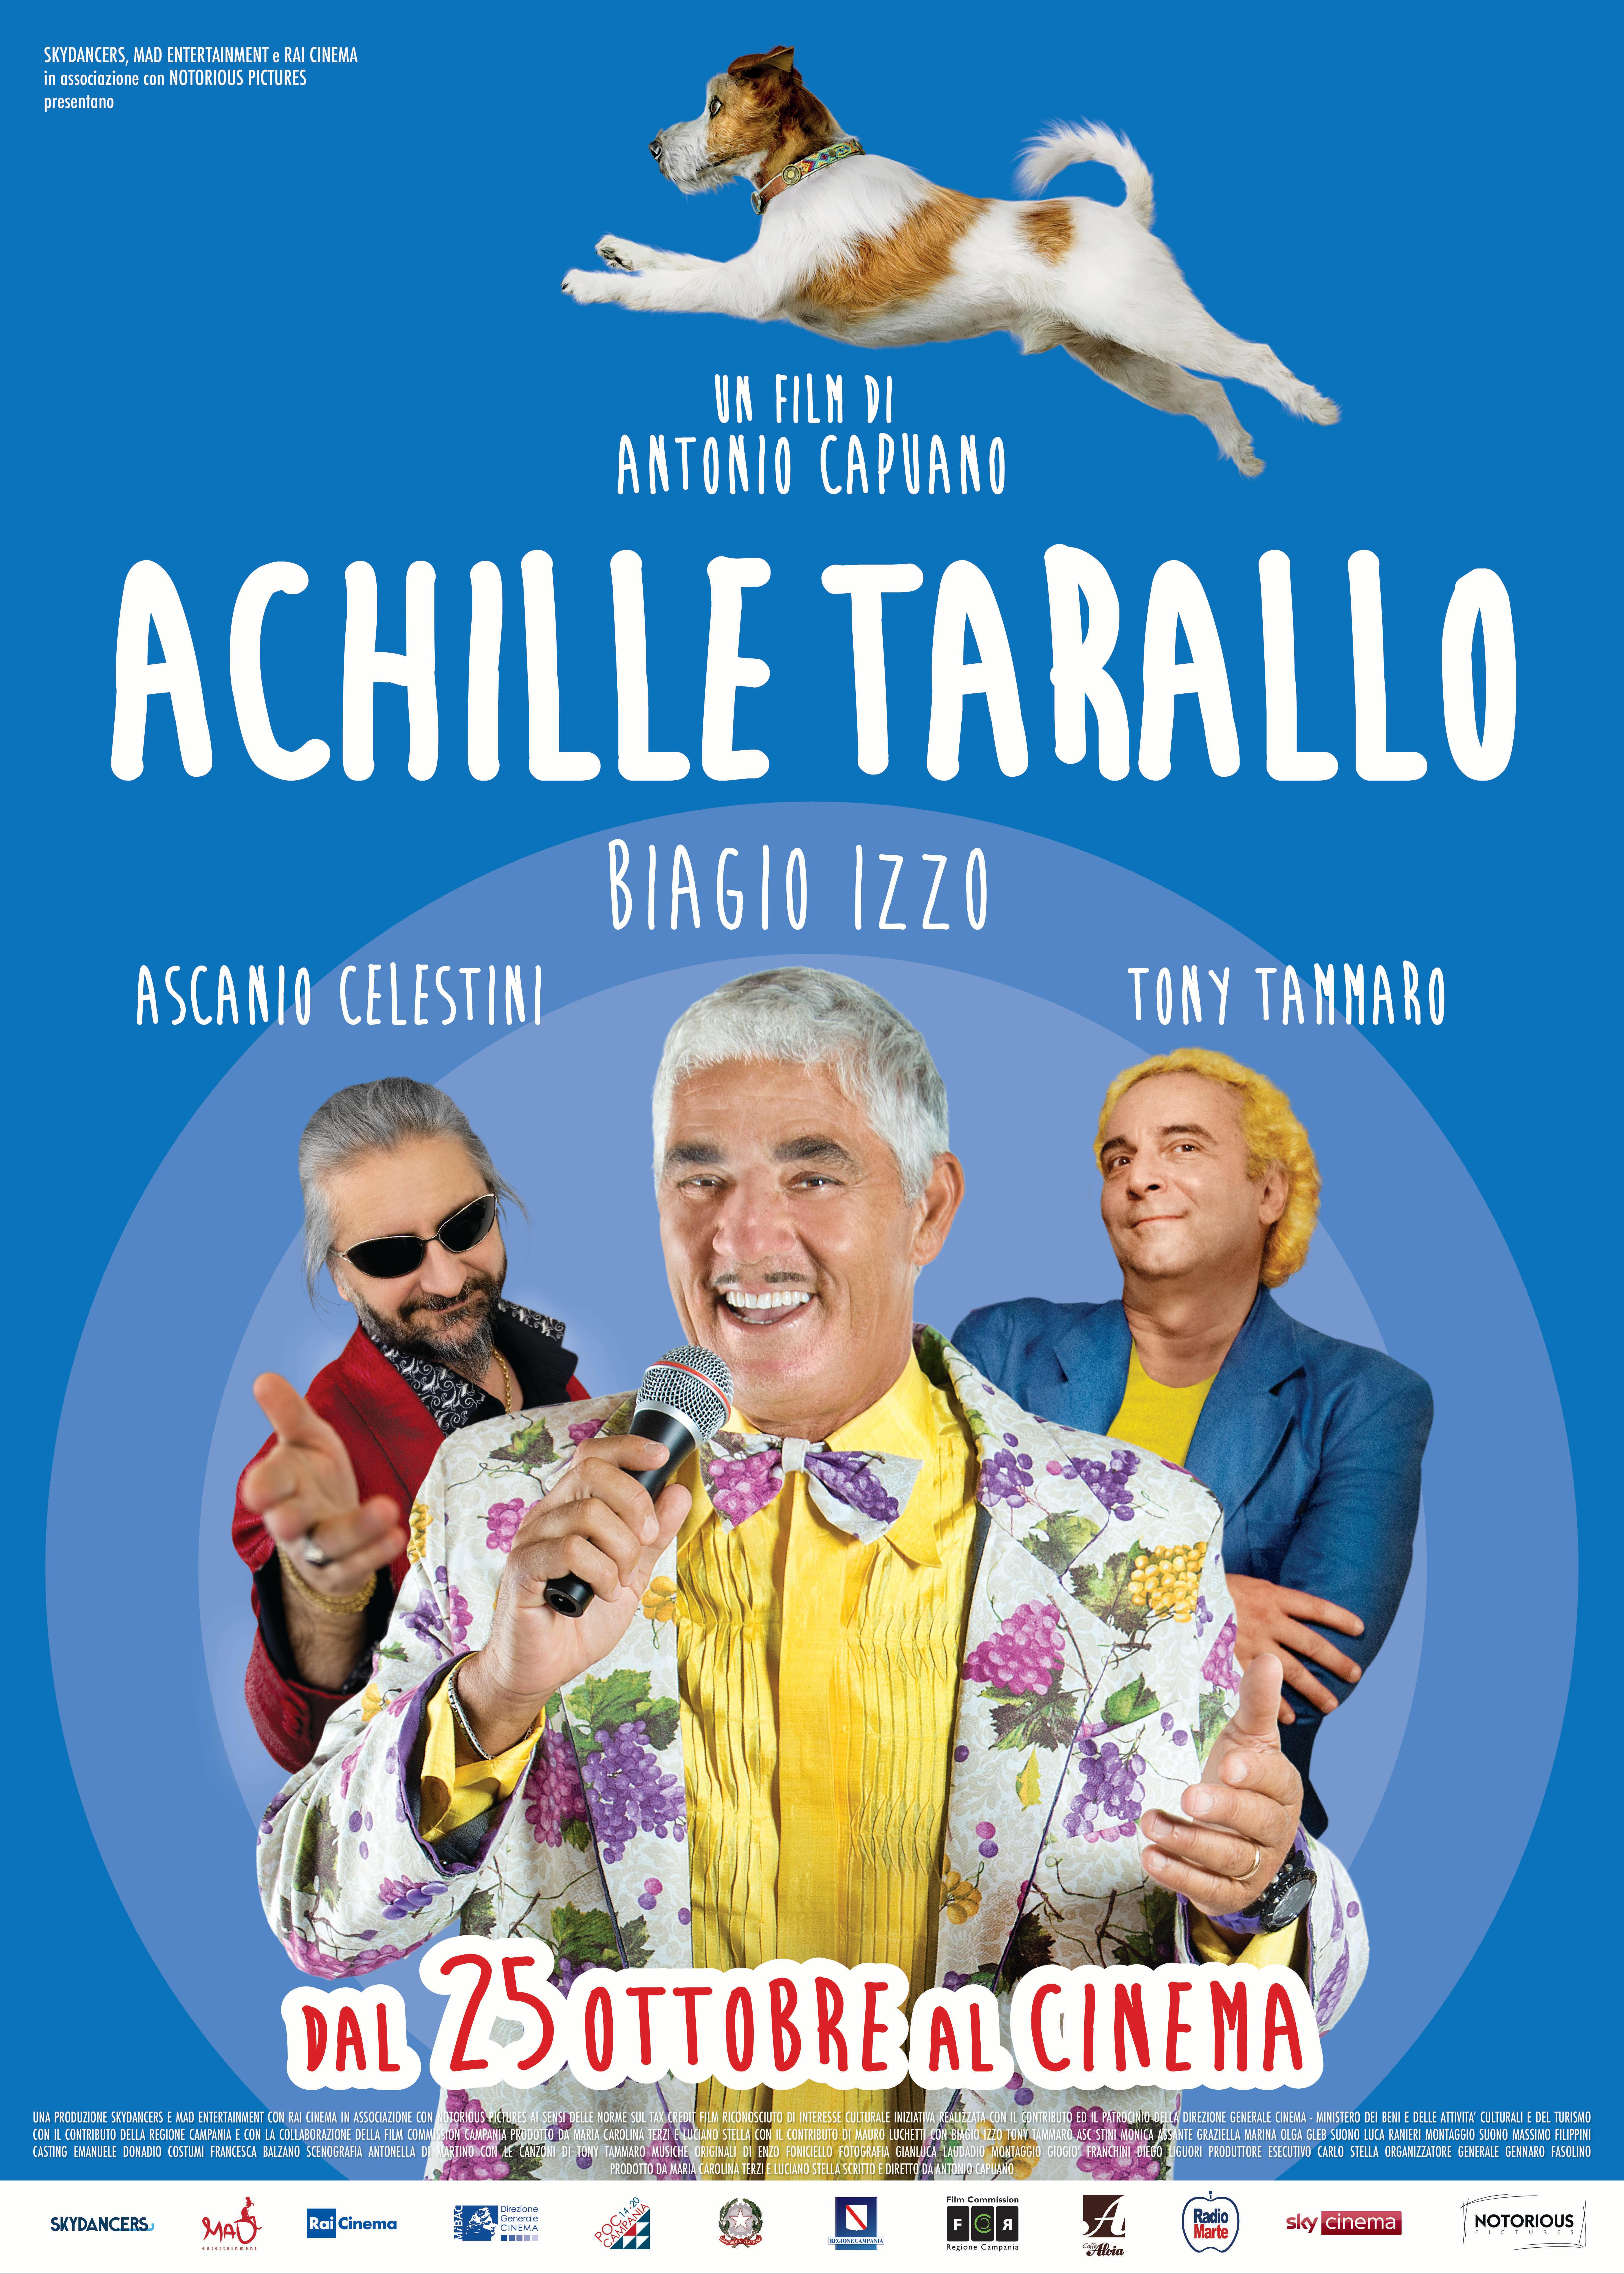 Achille Tarallo